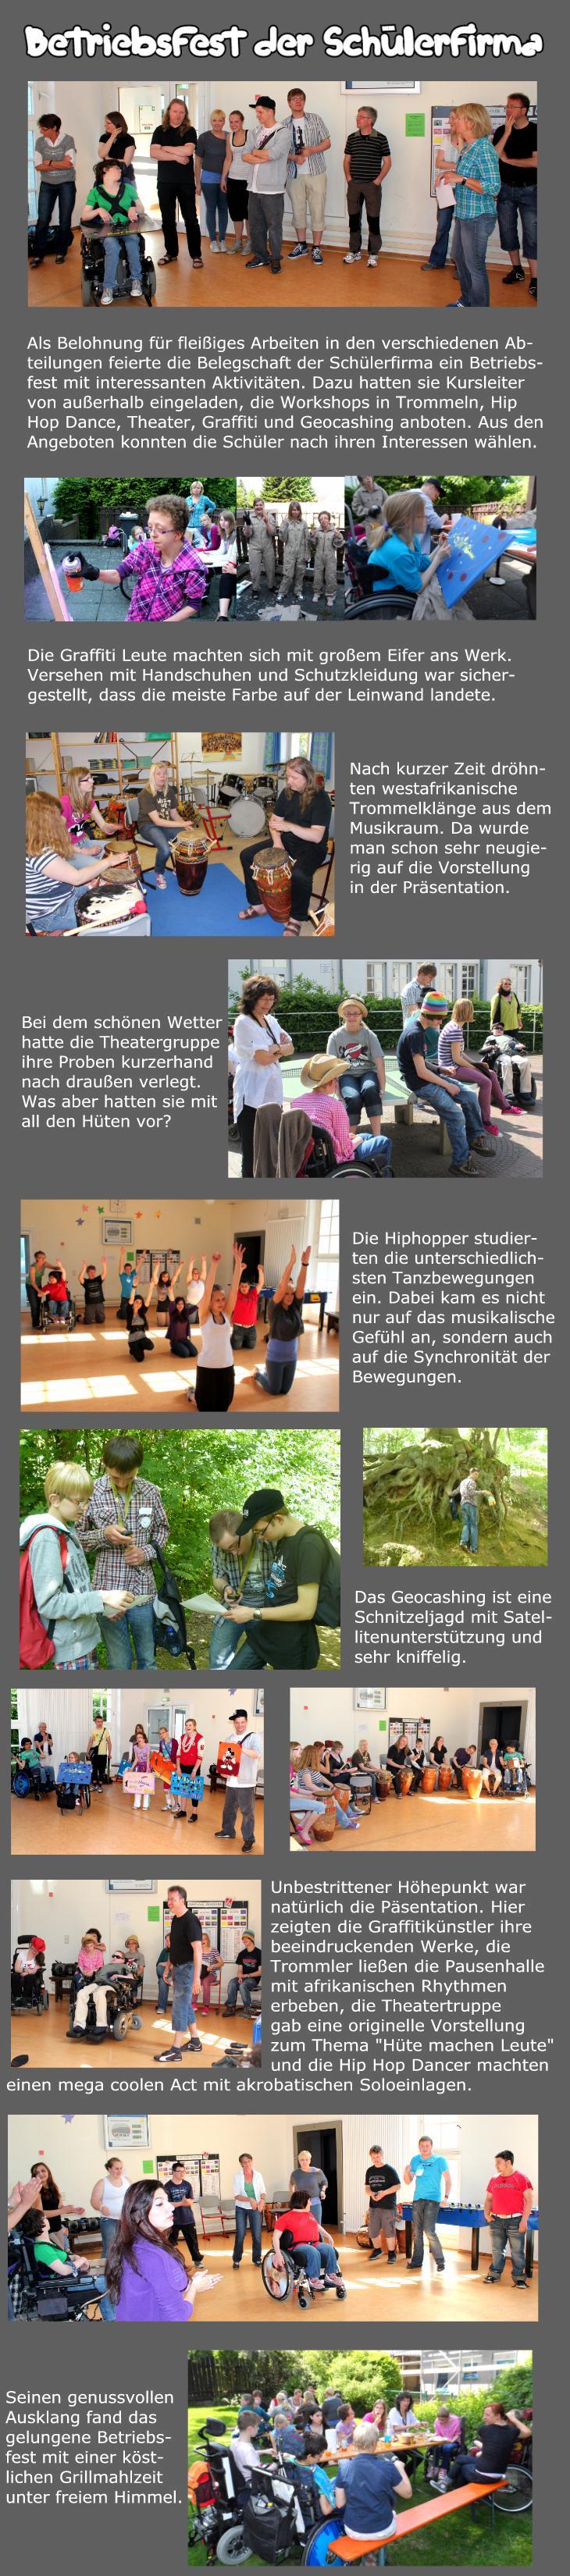 Betriebsfest 12